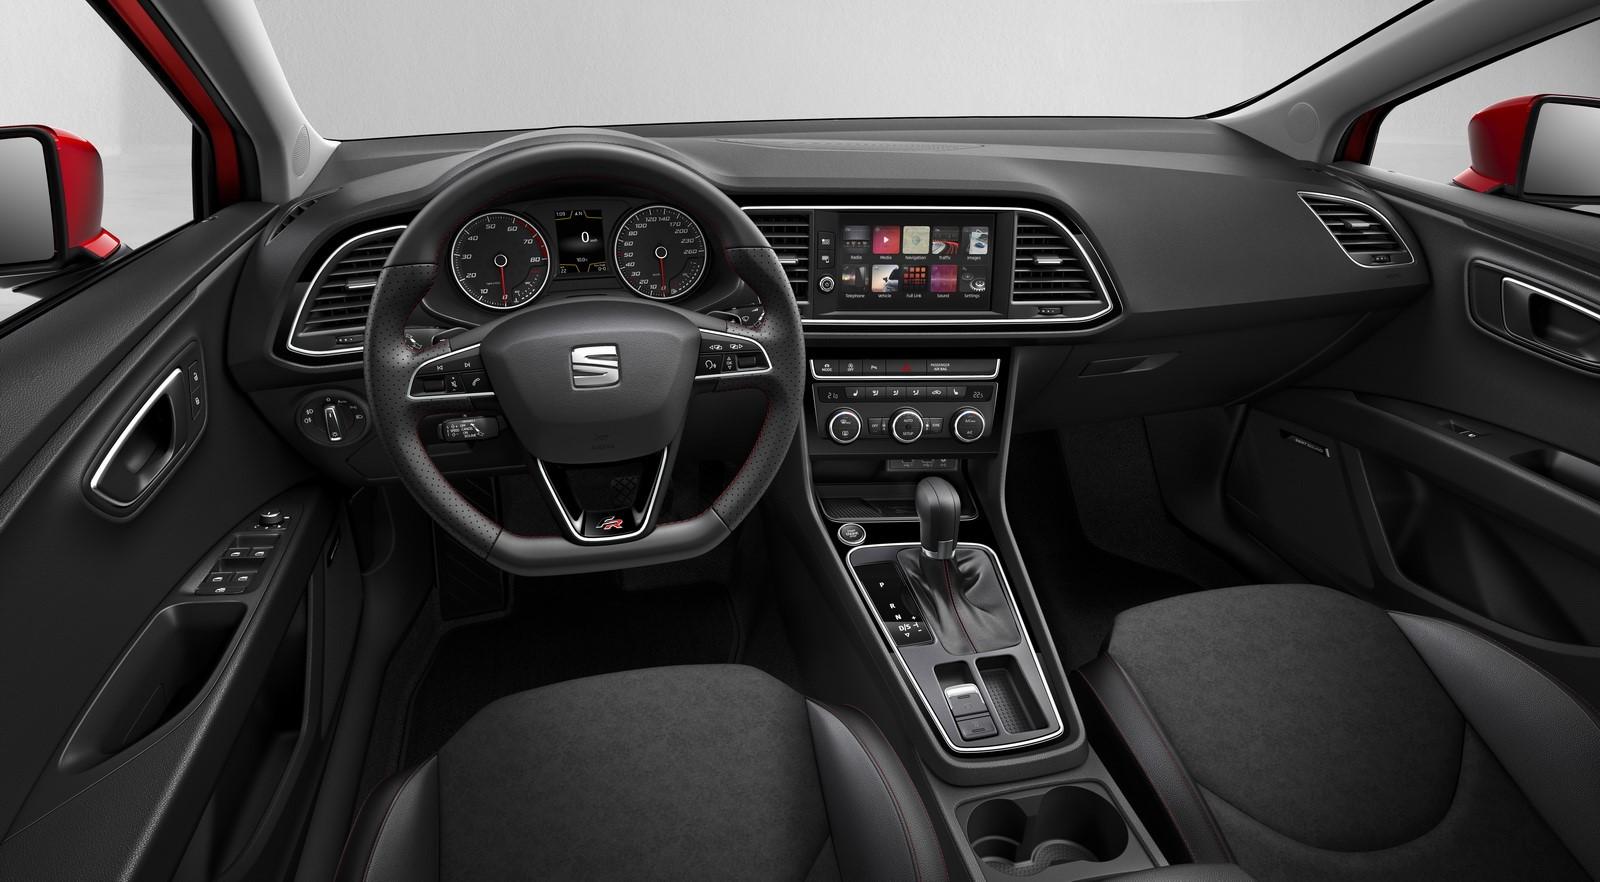 Seat Leon facelift 2017 (10)